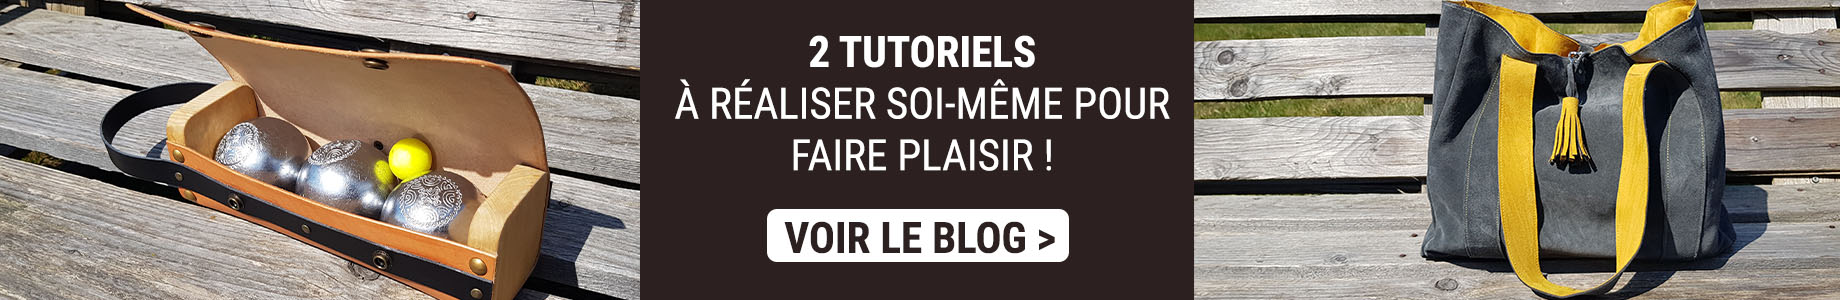 blog tutoriels